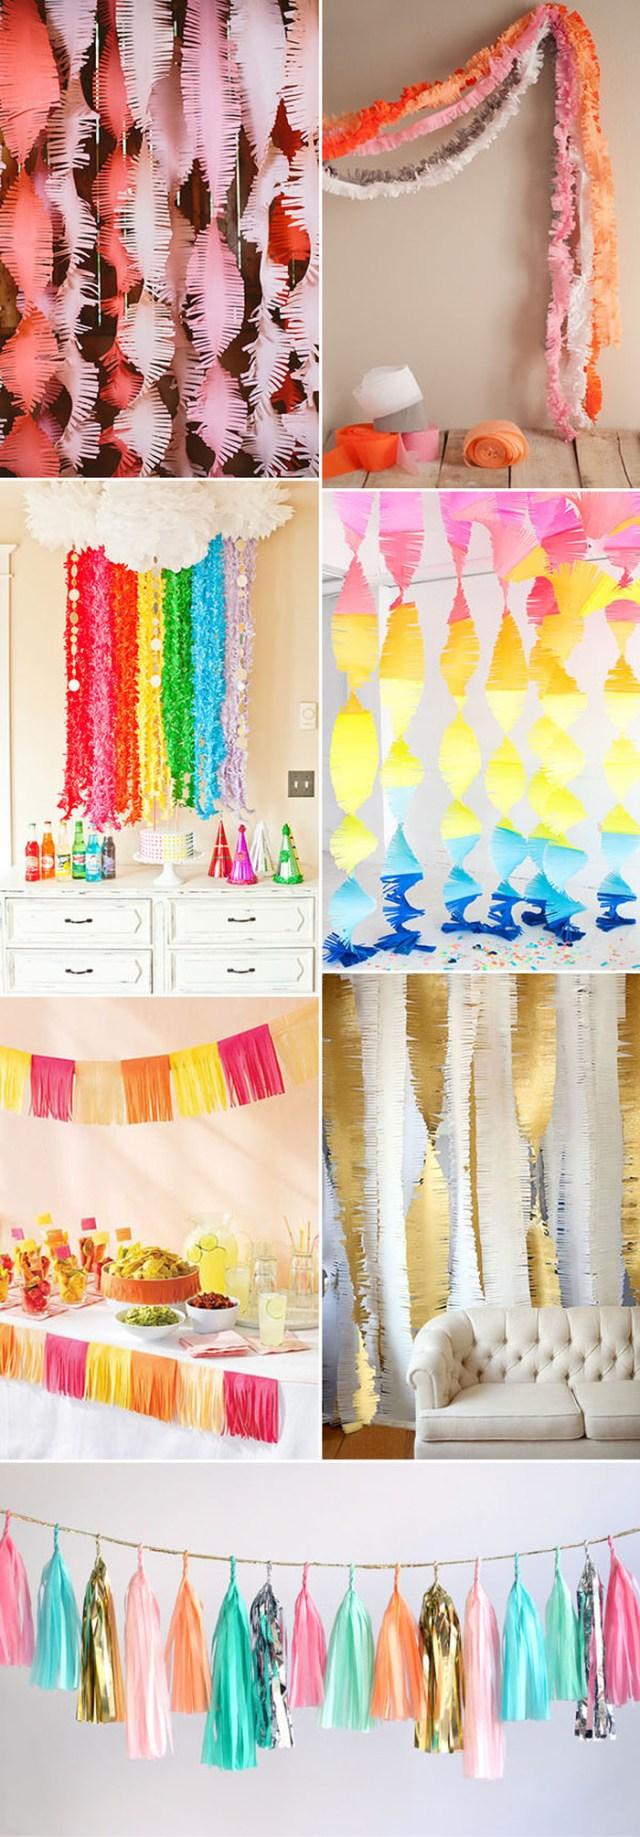 Diy Wedding Decor Ideas 19 Diy Wedding Decoration Ideas On A Budget Diy Wedding Decorations